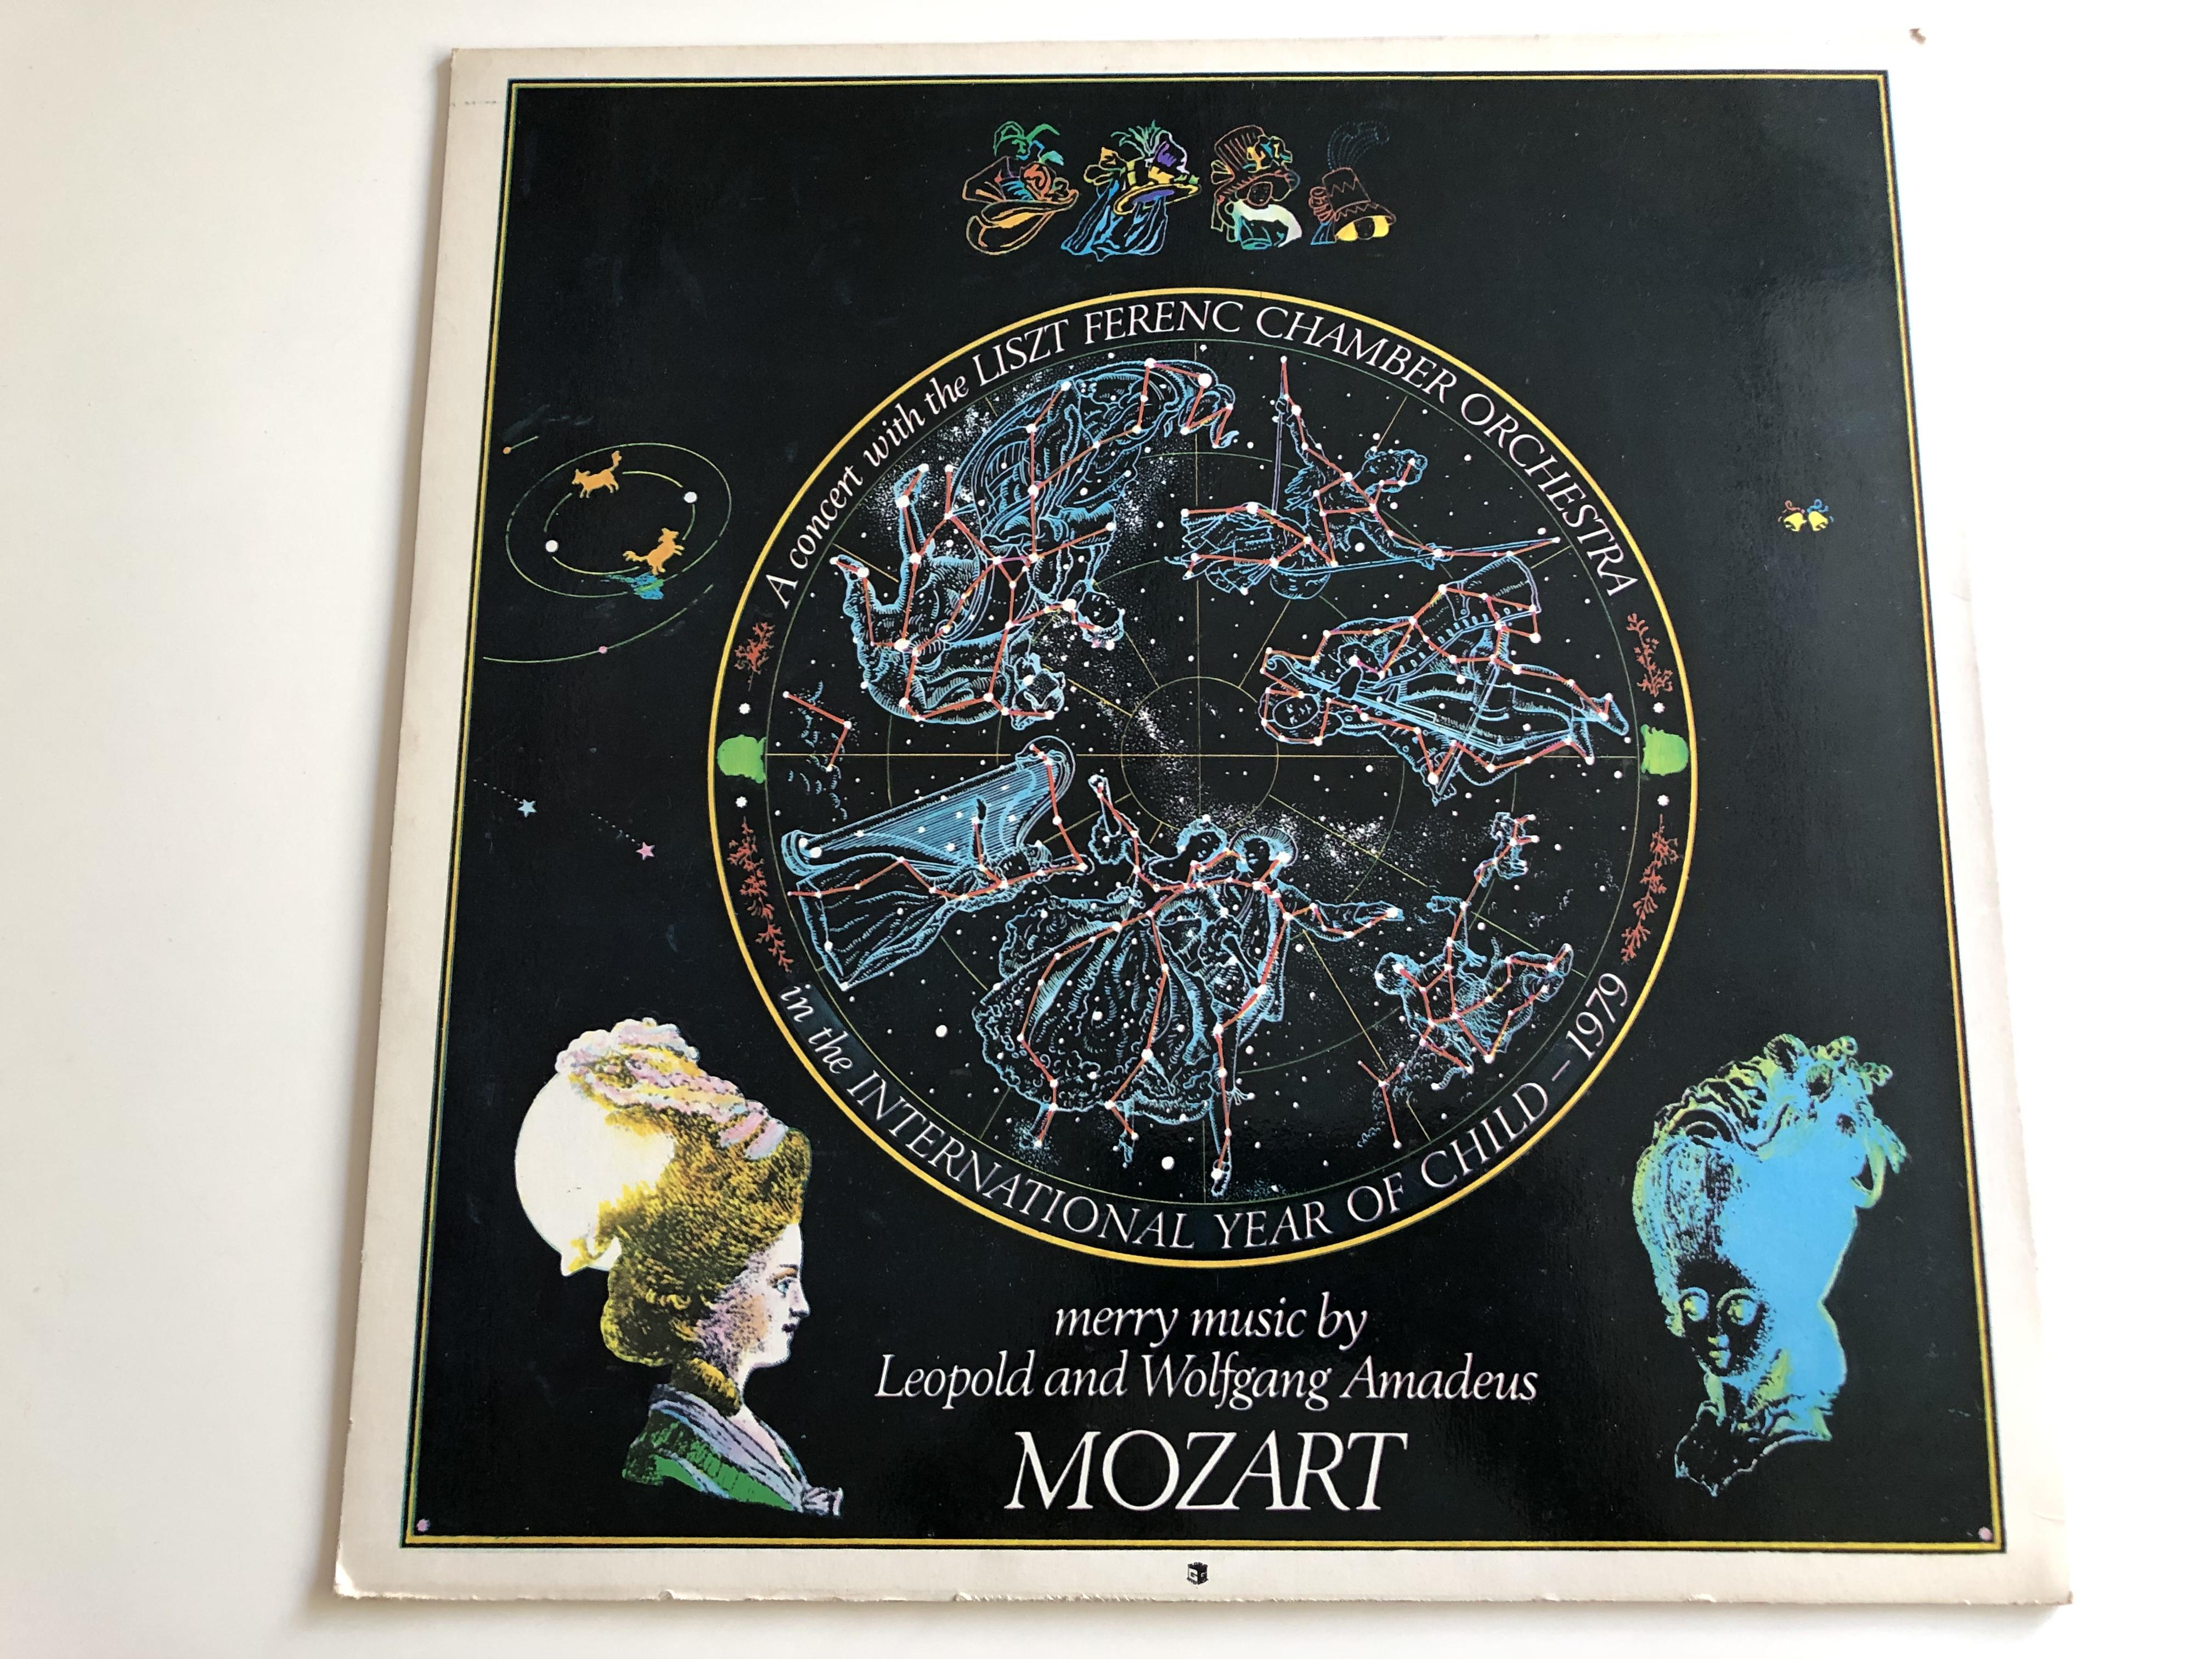 leopold-es-wolfgang-amadeus-mozart-vid-m-zen-i-conducted-j-nos-rolla-liszt-ferenc-kamarazenekar-koncertje-hungaroton-lp-stereo-slpx-12-166-2-.jpg